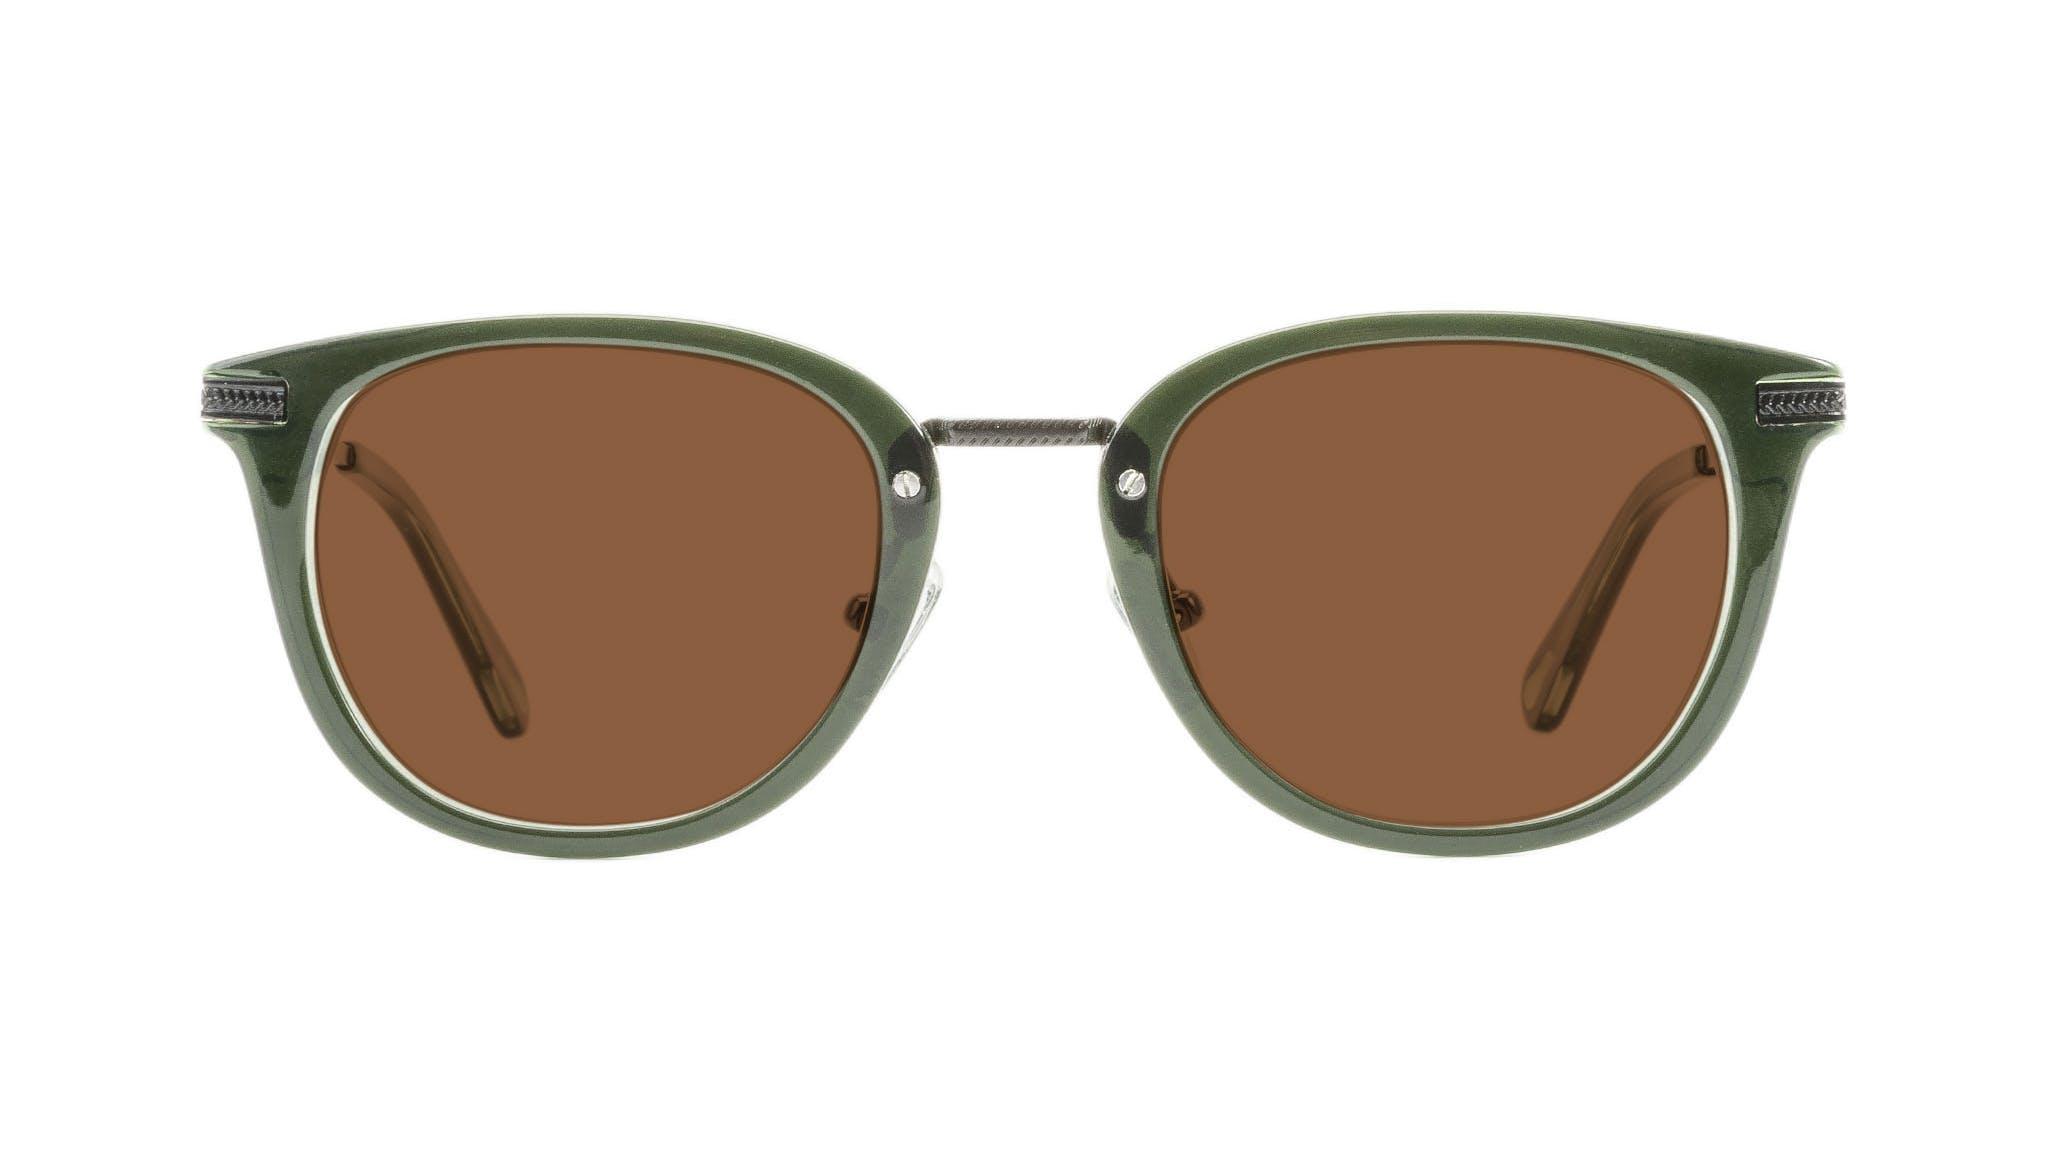 Affordable Fashion Glasses Rectangle Square Sunglasses Men Street Soul Olive Front